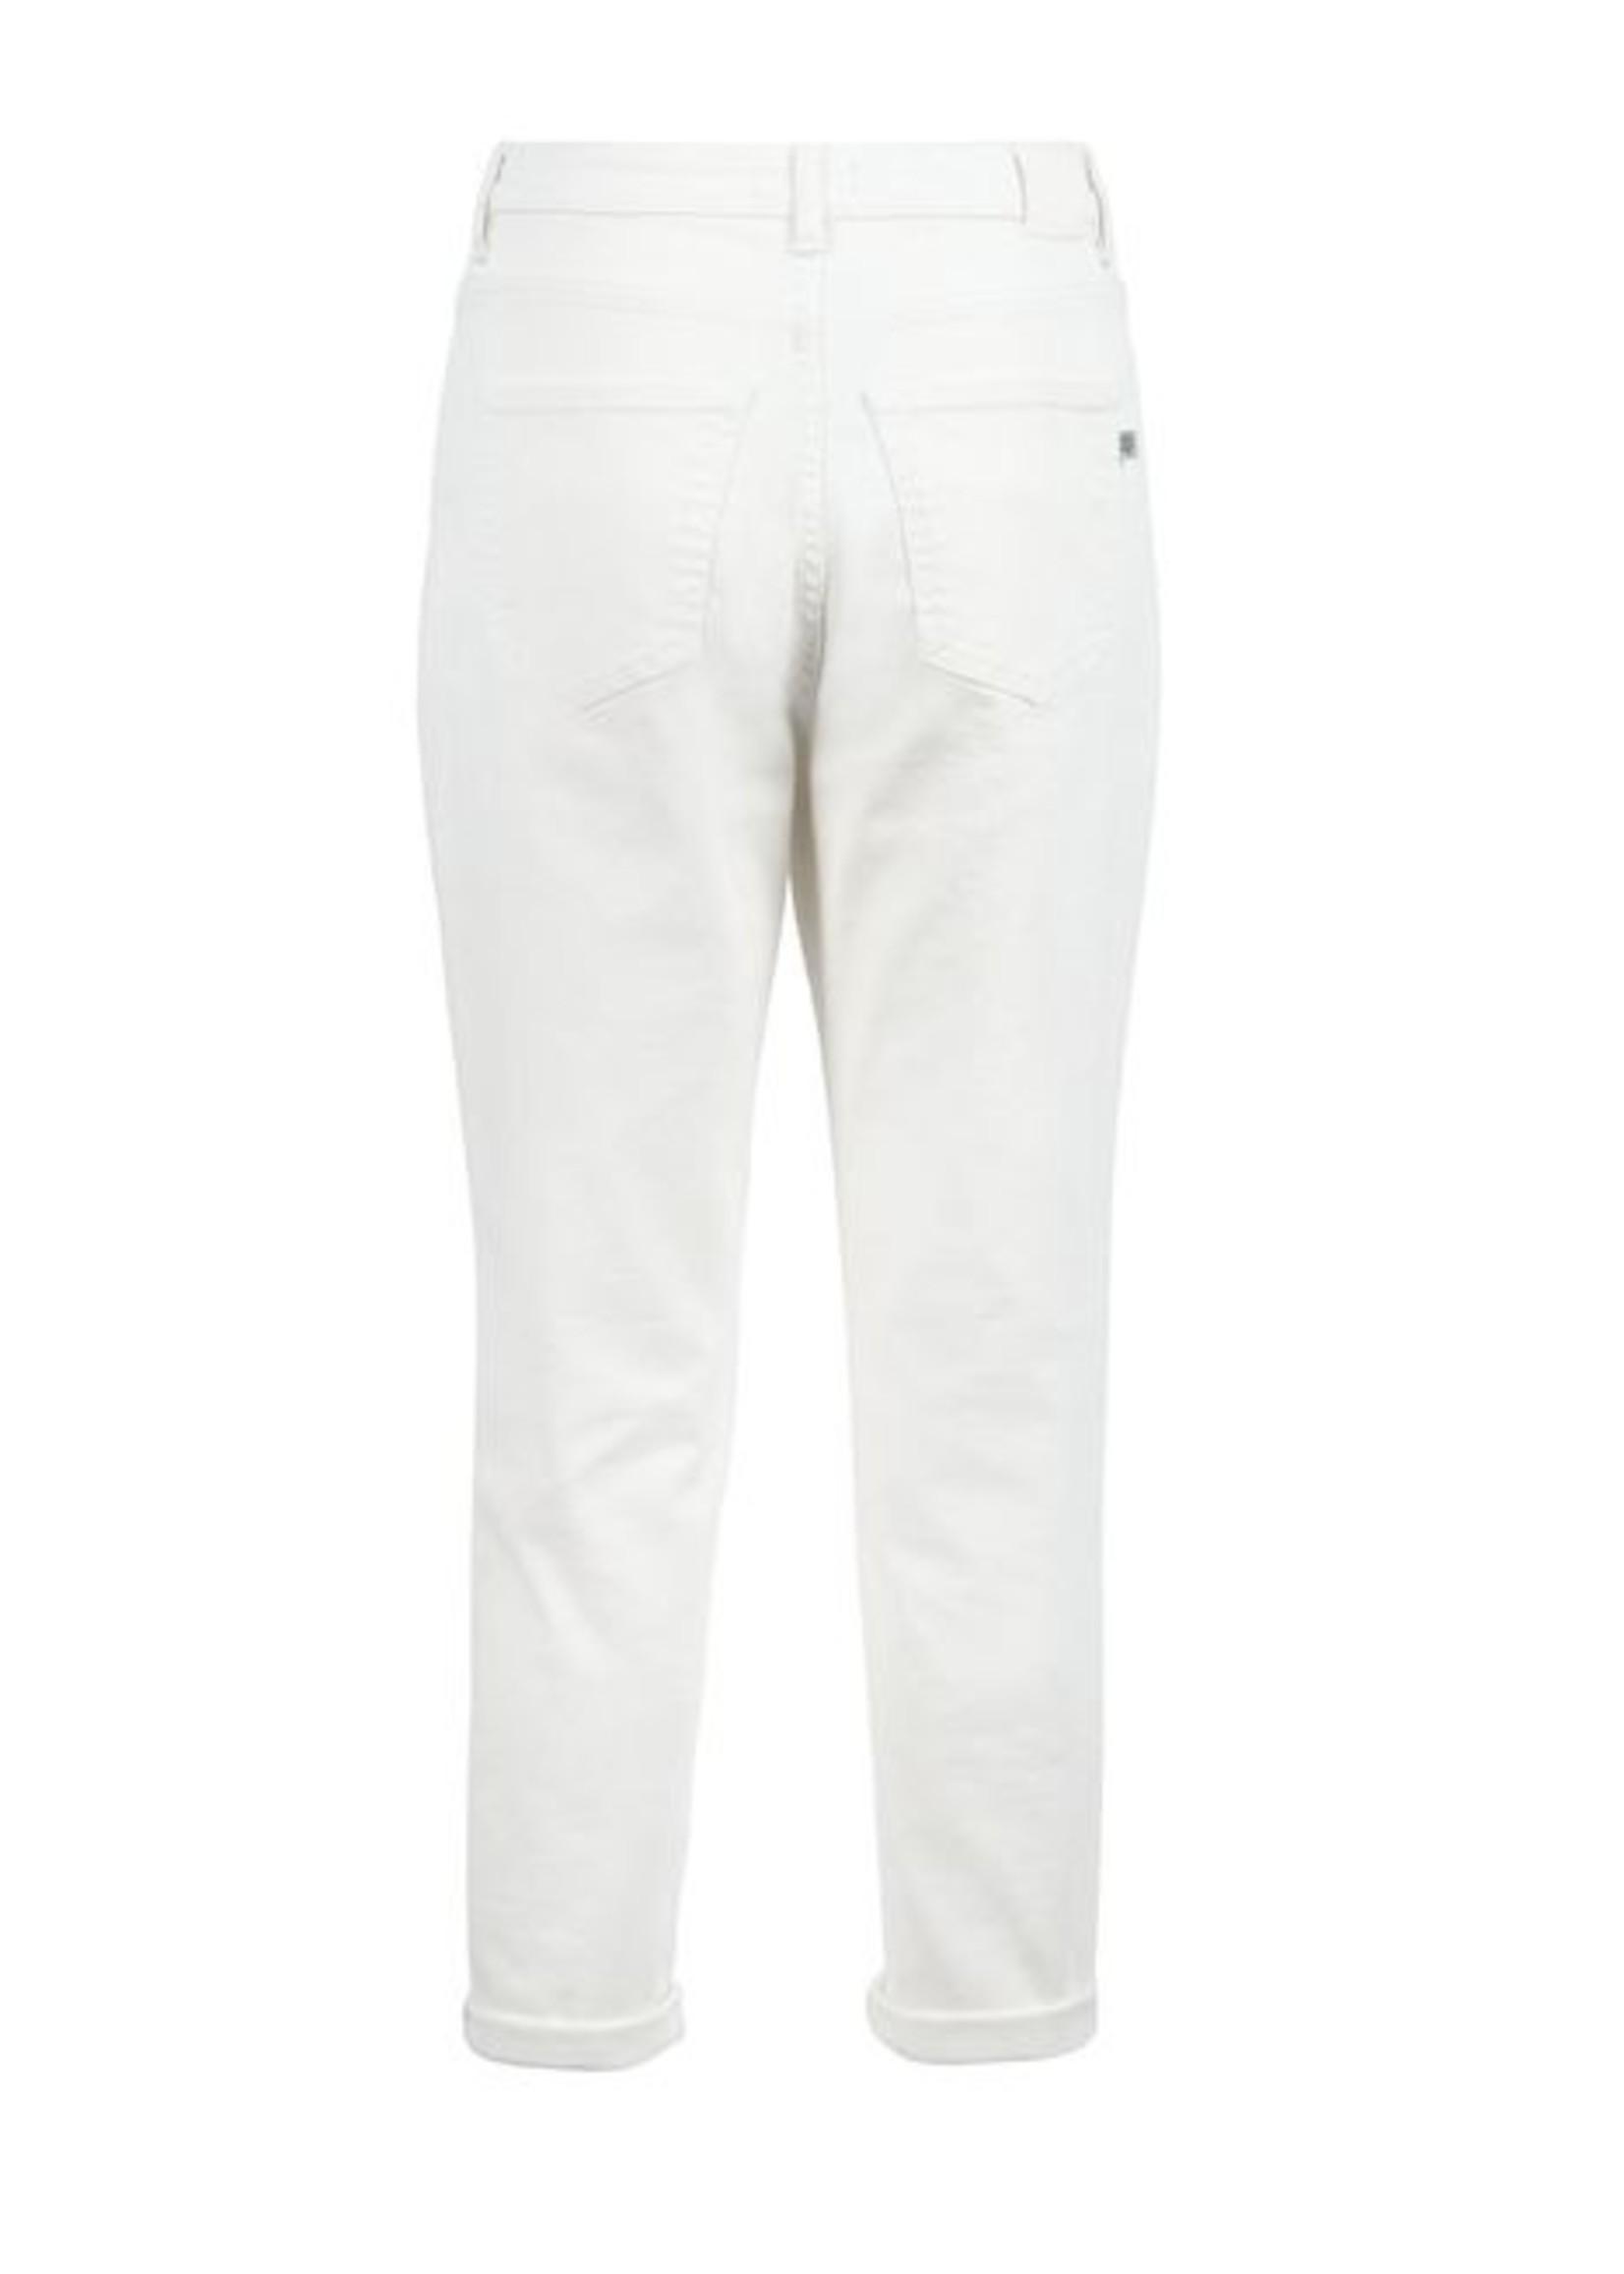 Zusss Trendy Mom Jeans White